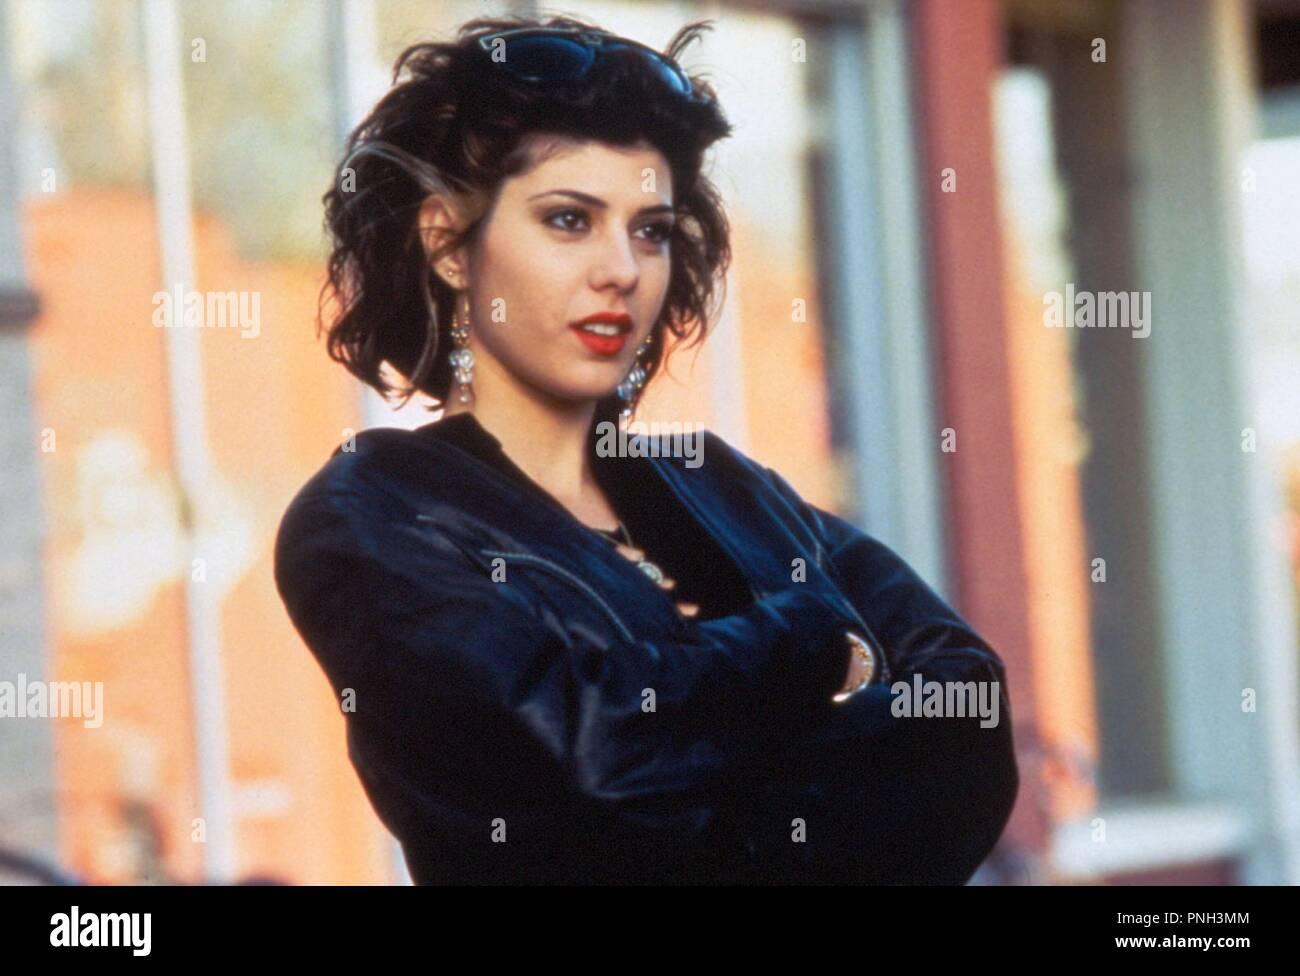 Original film title: MY COUSIN VINNY. English title: MY COUSIN VINNY. Year: 1992. Director: JONATHAN LYNN. Stars: MARISA TOMEI. Credit: 20TH CENTURY FOX / Album - Stock Image